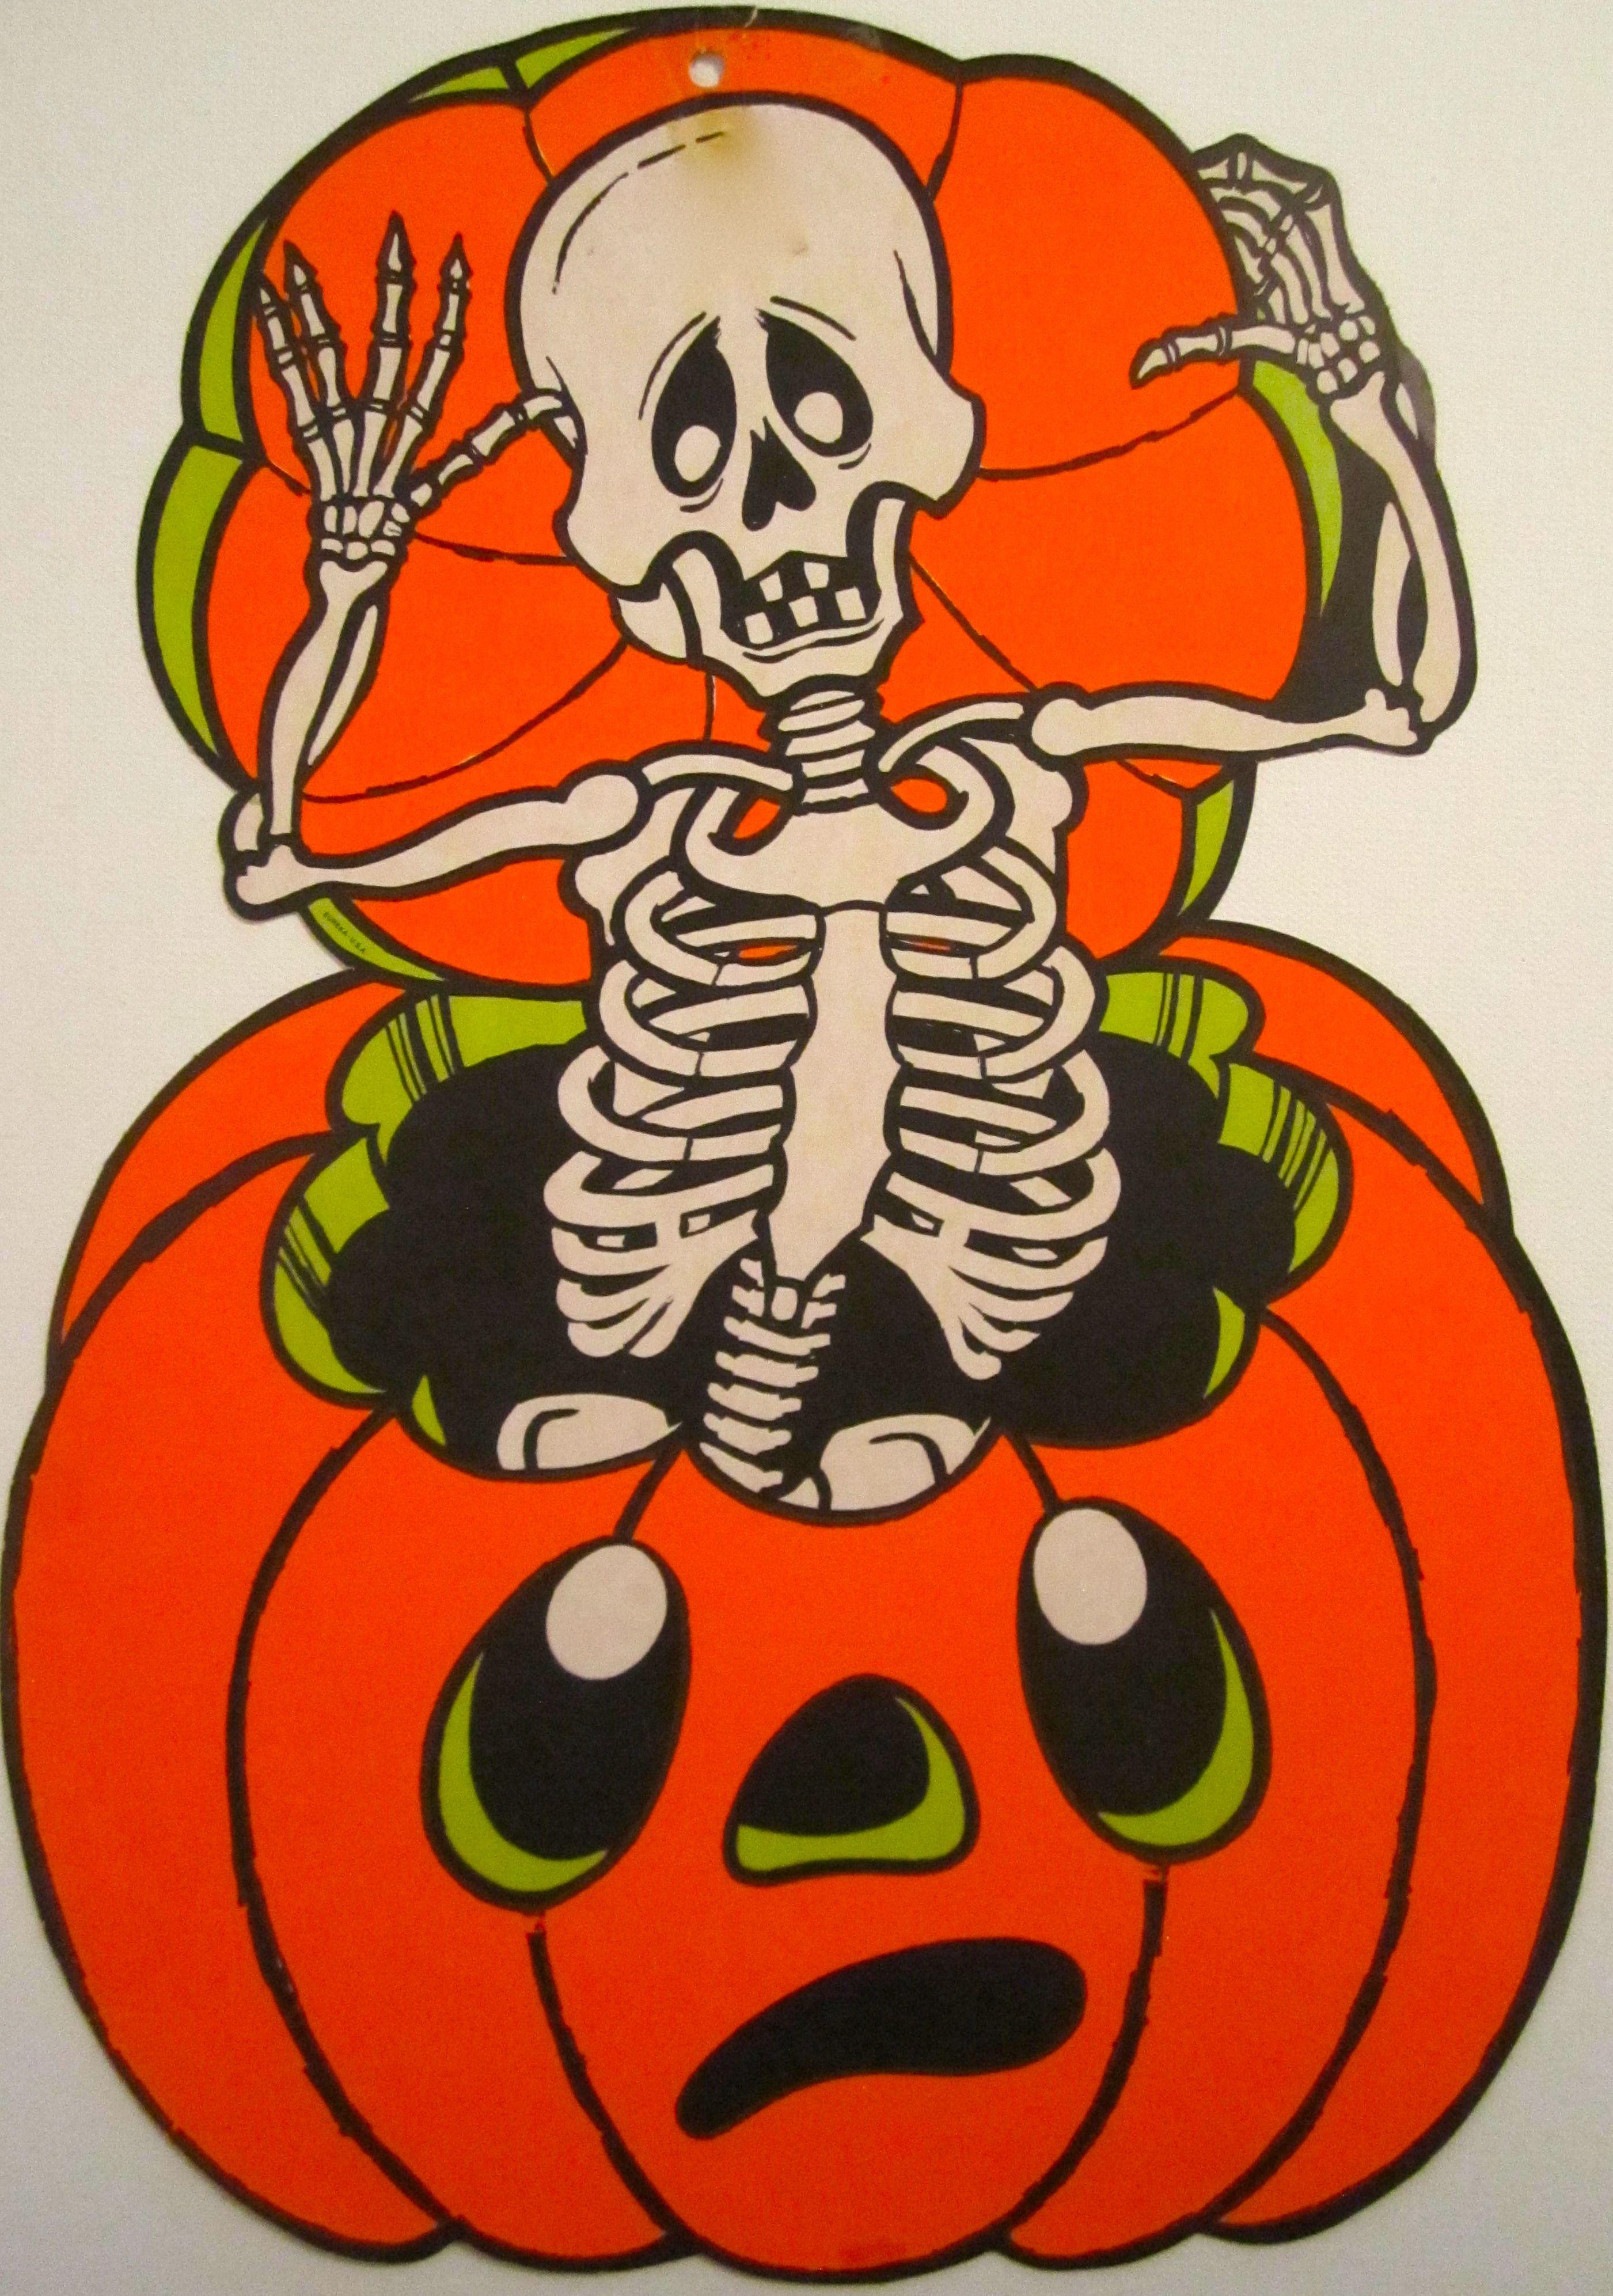 Vintage Eureka Skeleton 1970 S Early 1980 S Vintage Halloween Images Halloween Skeletons Vintage Halloween Decorations